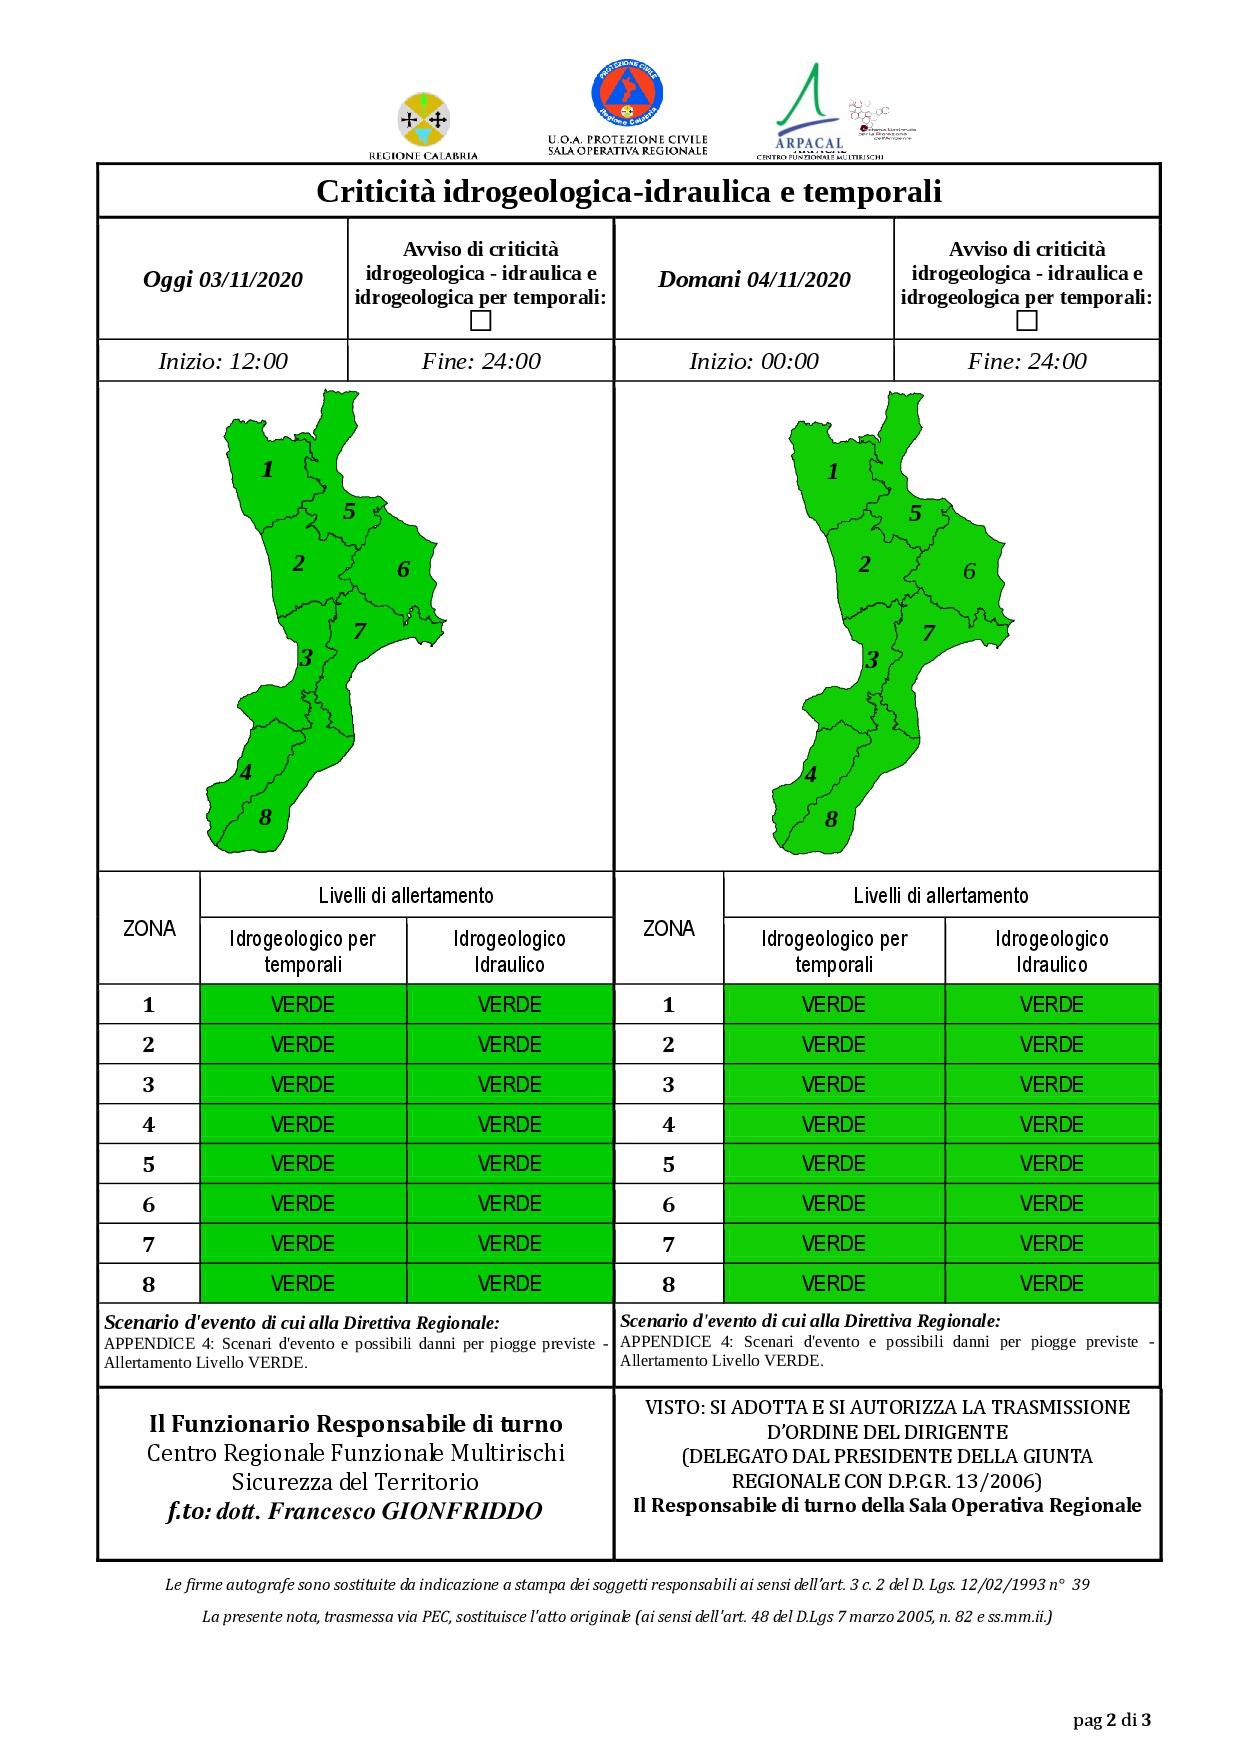 Criticità idrogeologica-idraulica e temporali in Calabria 03-11-2020